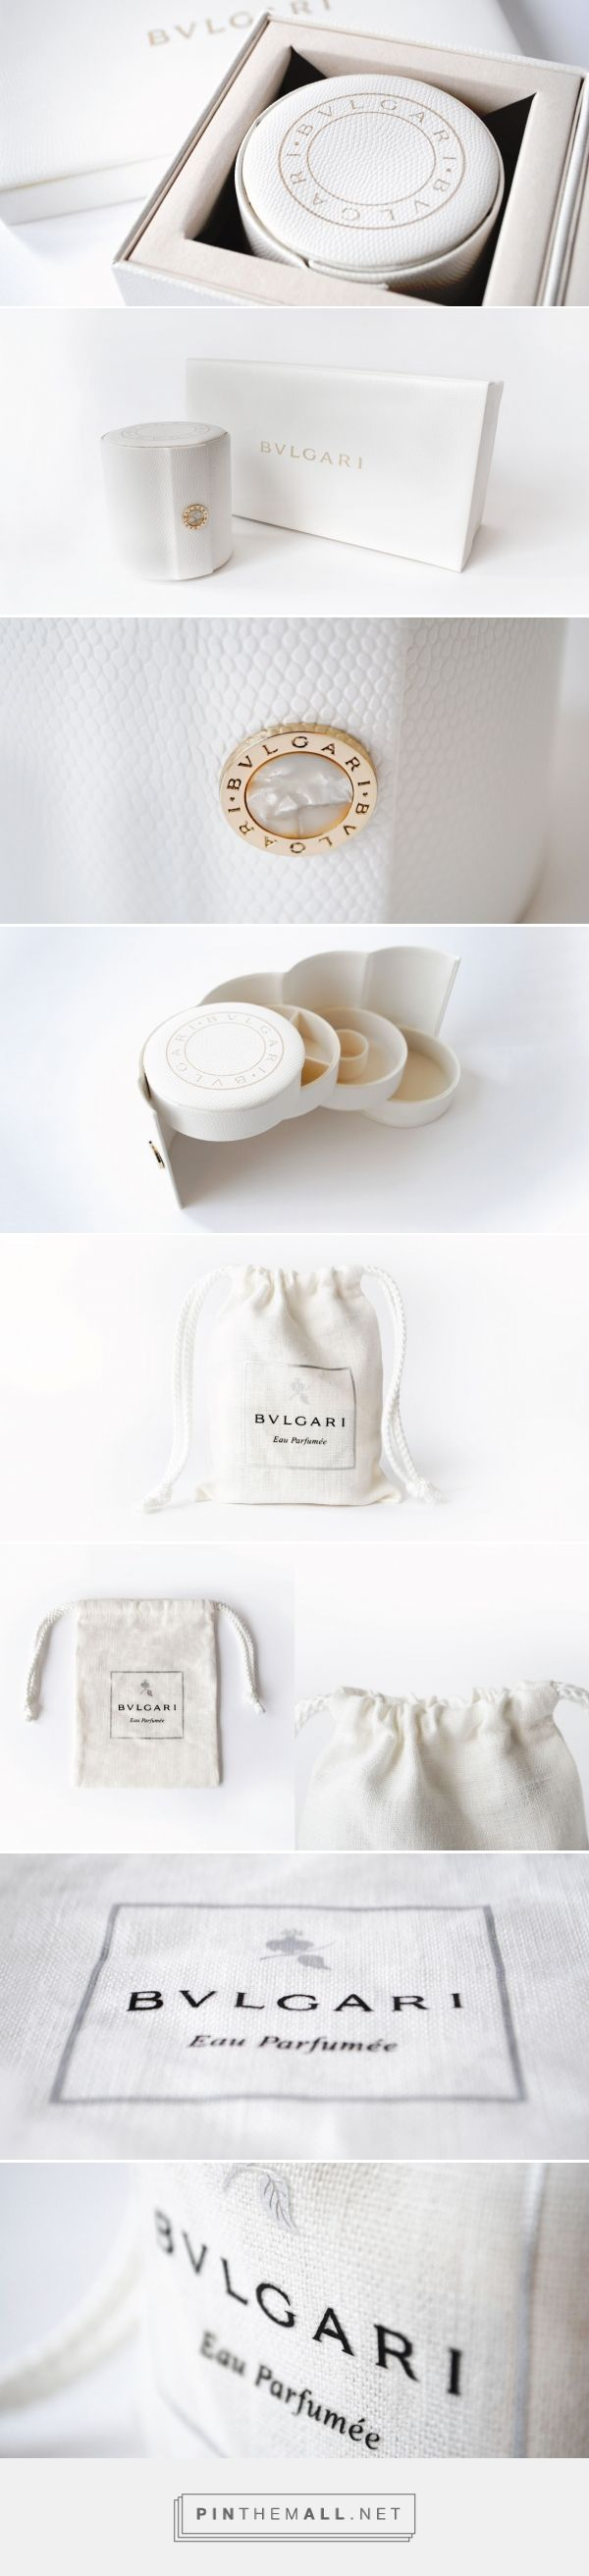 Bvlgari | Luxury Packaging Design | Creative Retail Packaging | crpkg.com…